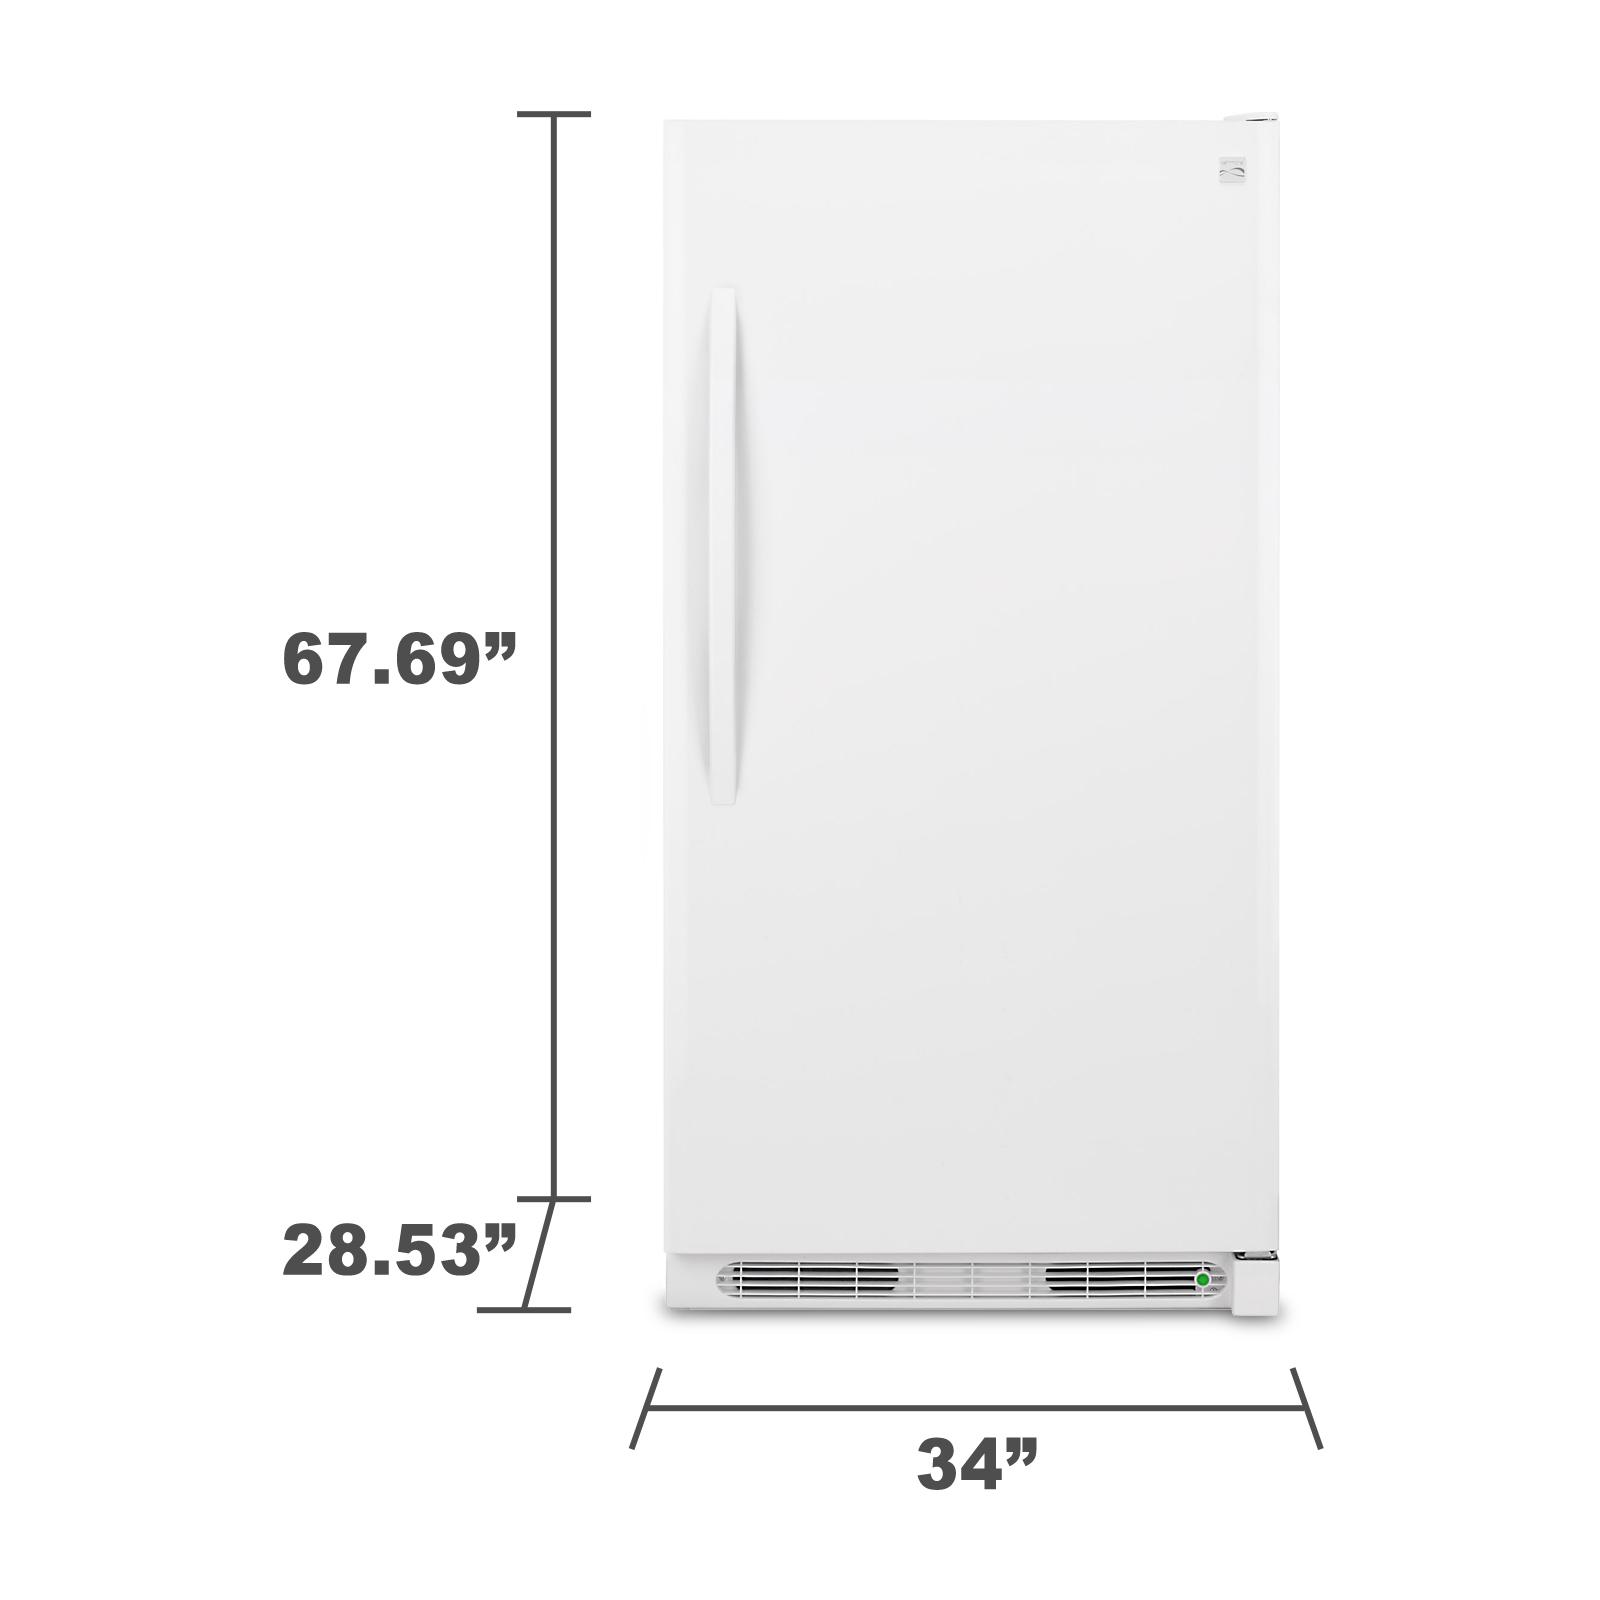 Kenmore 22742 16.6 cu. ft. Upright Freezer - White